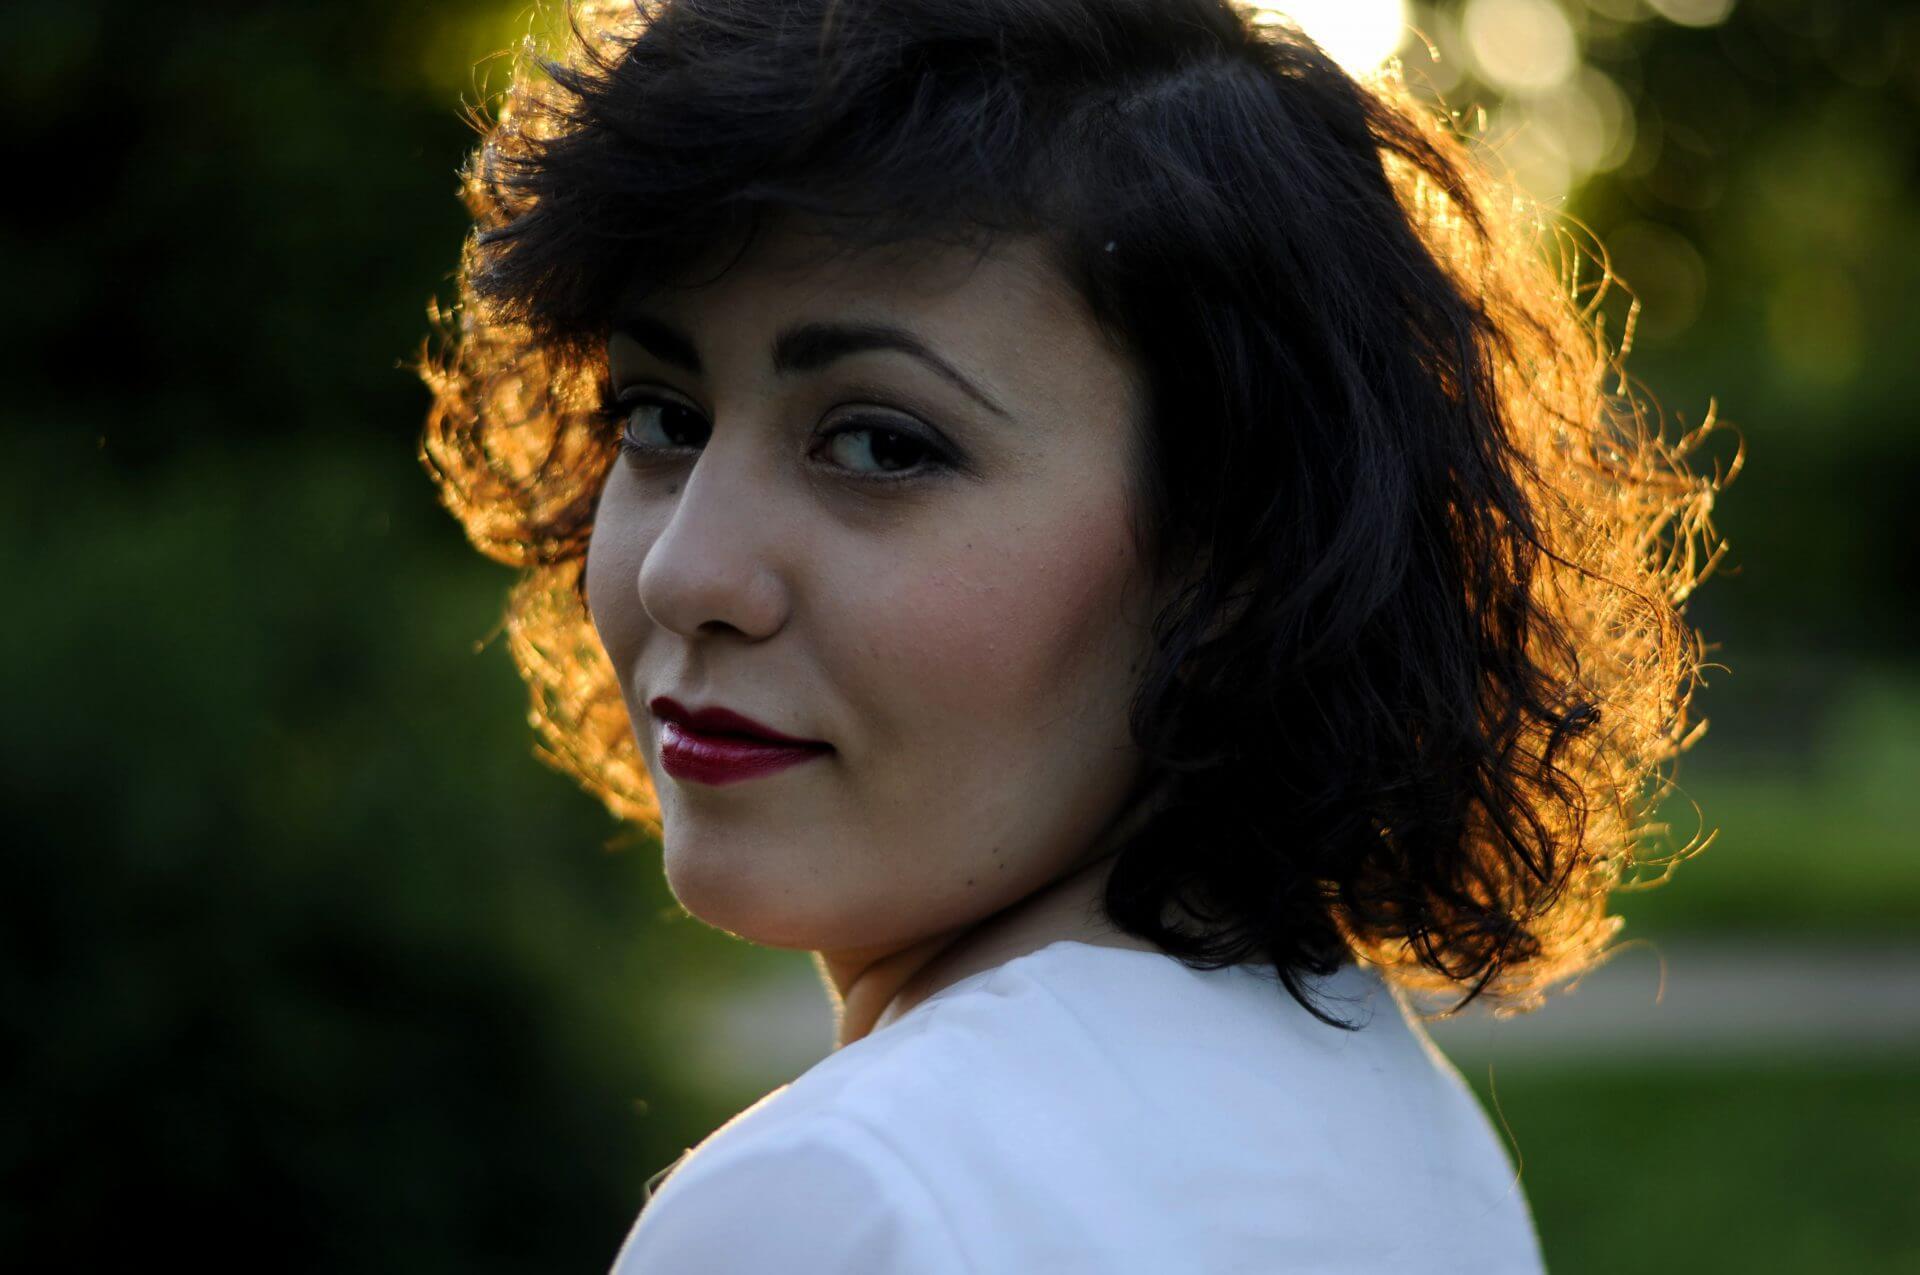 Karolina Kapusta